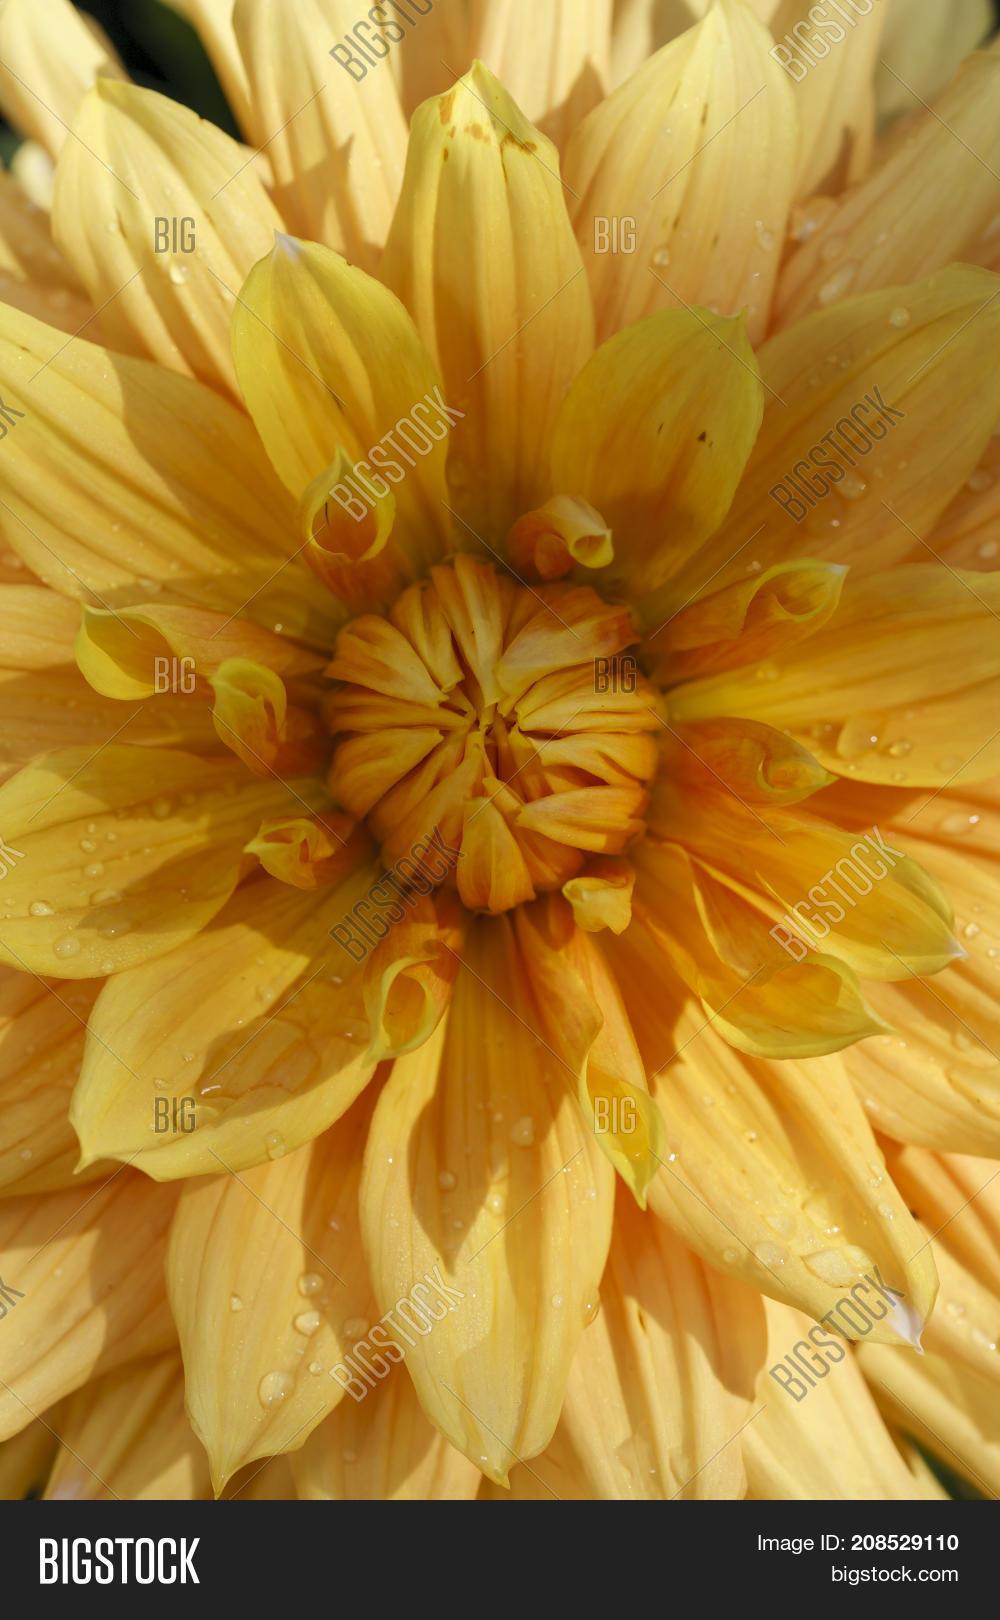 Inside Yellow Dahlia Image Photo Free Trial Bigstock